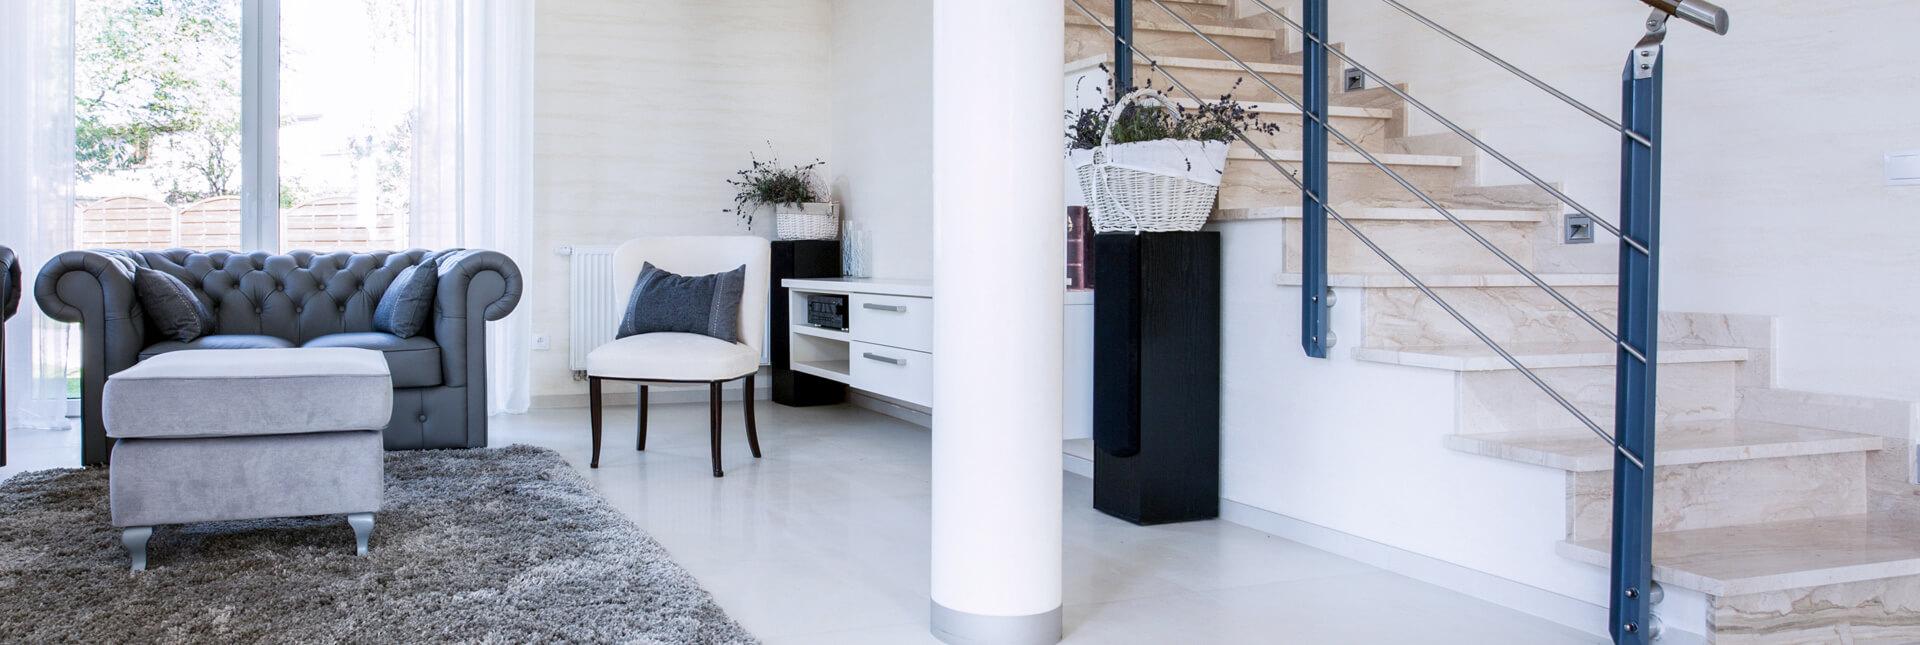 Stone Surgeon - White Living Room Clean Granite